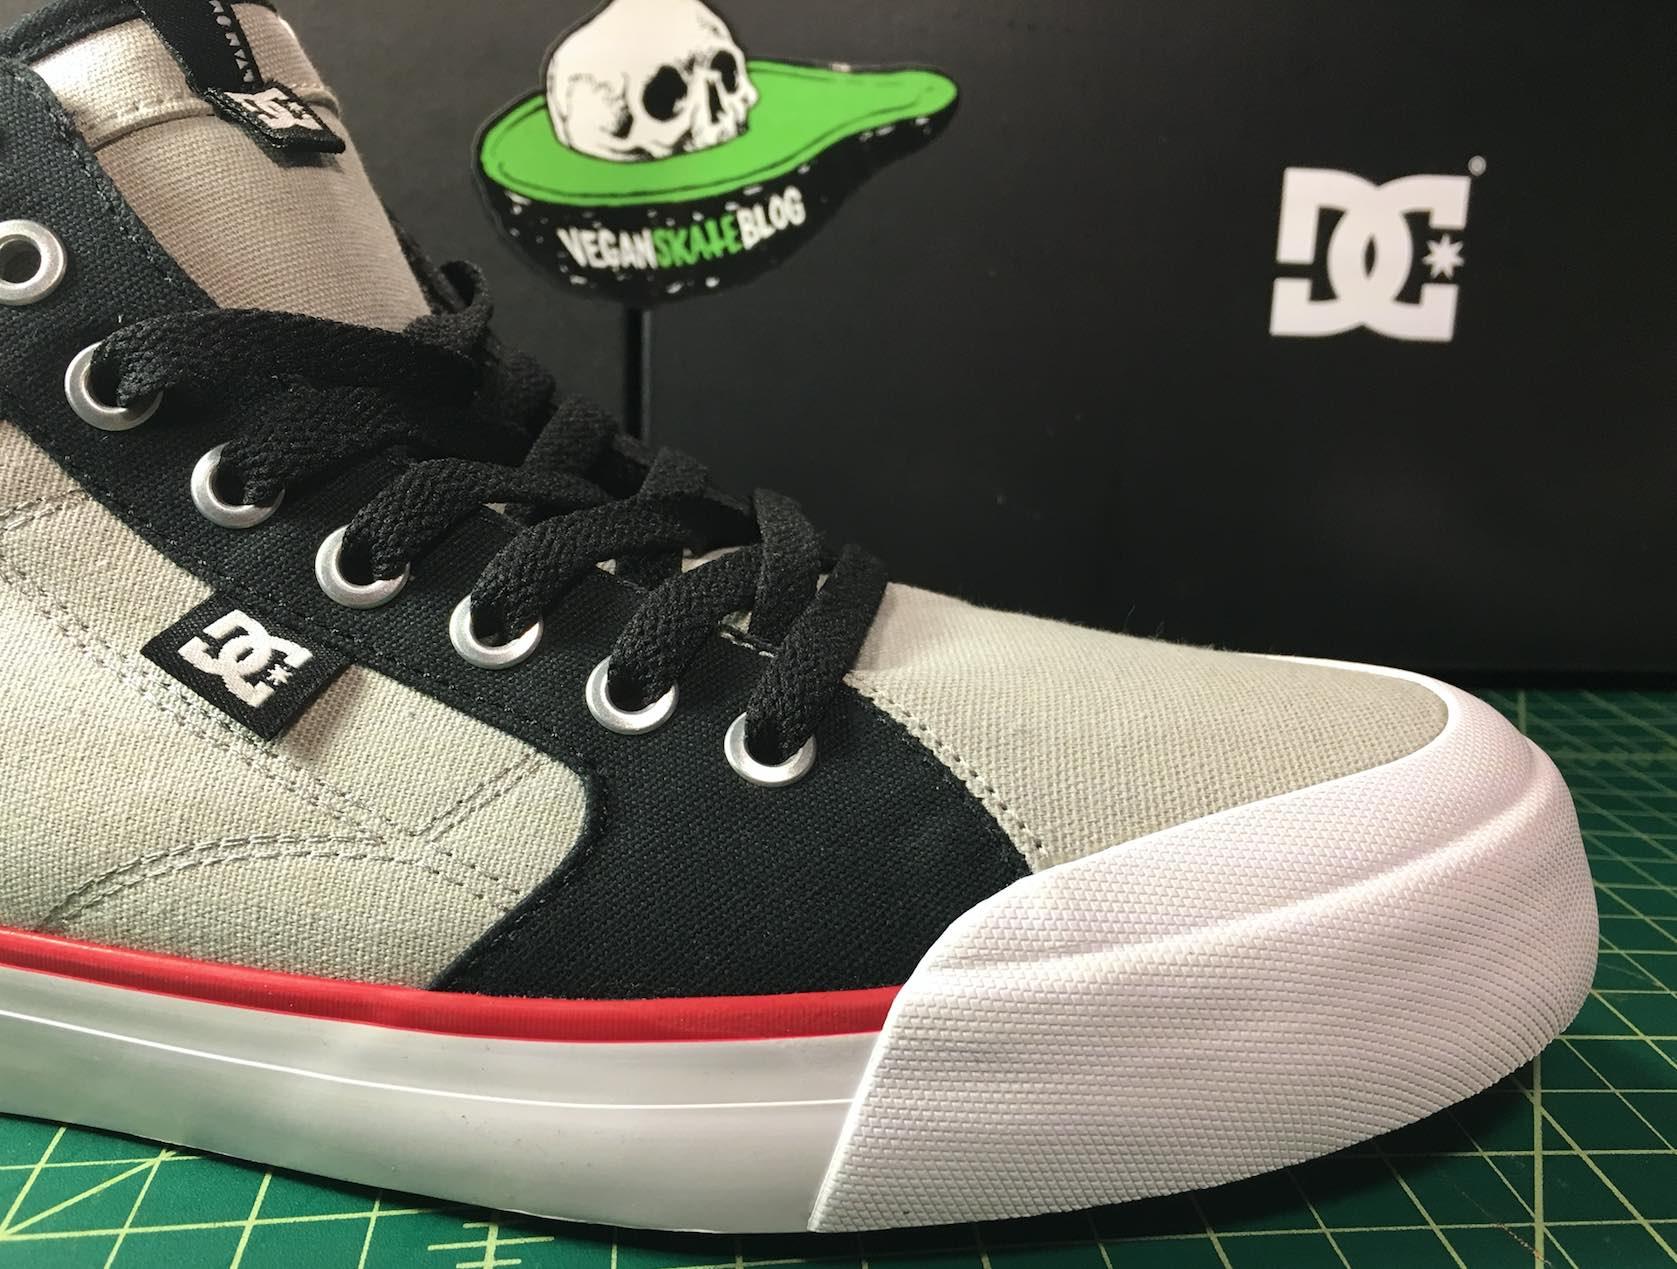 Evan Smith Vegan Skateboarder Veg Non-leather canvas shoe DC Hi-top vegetable shredder